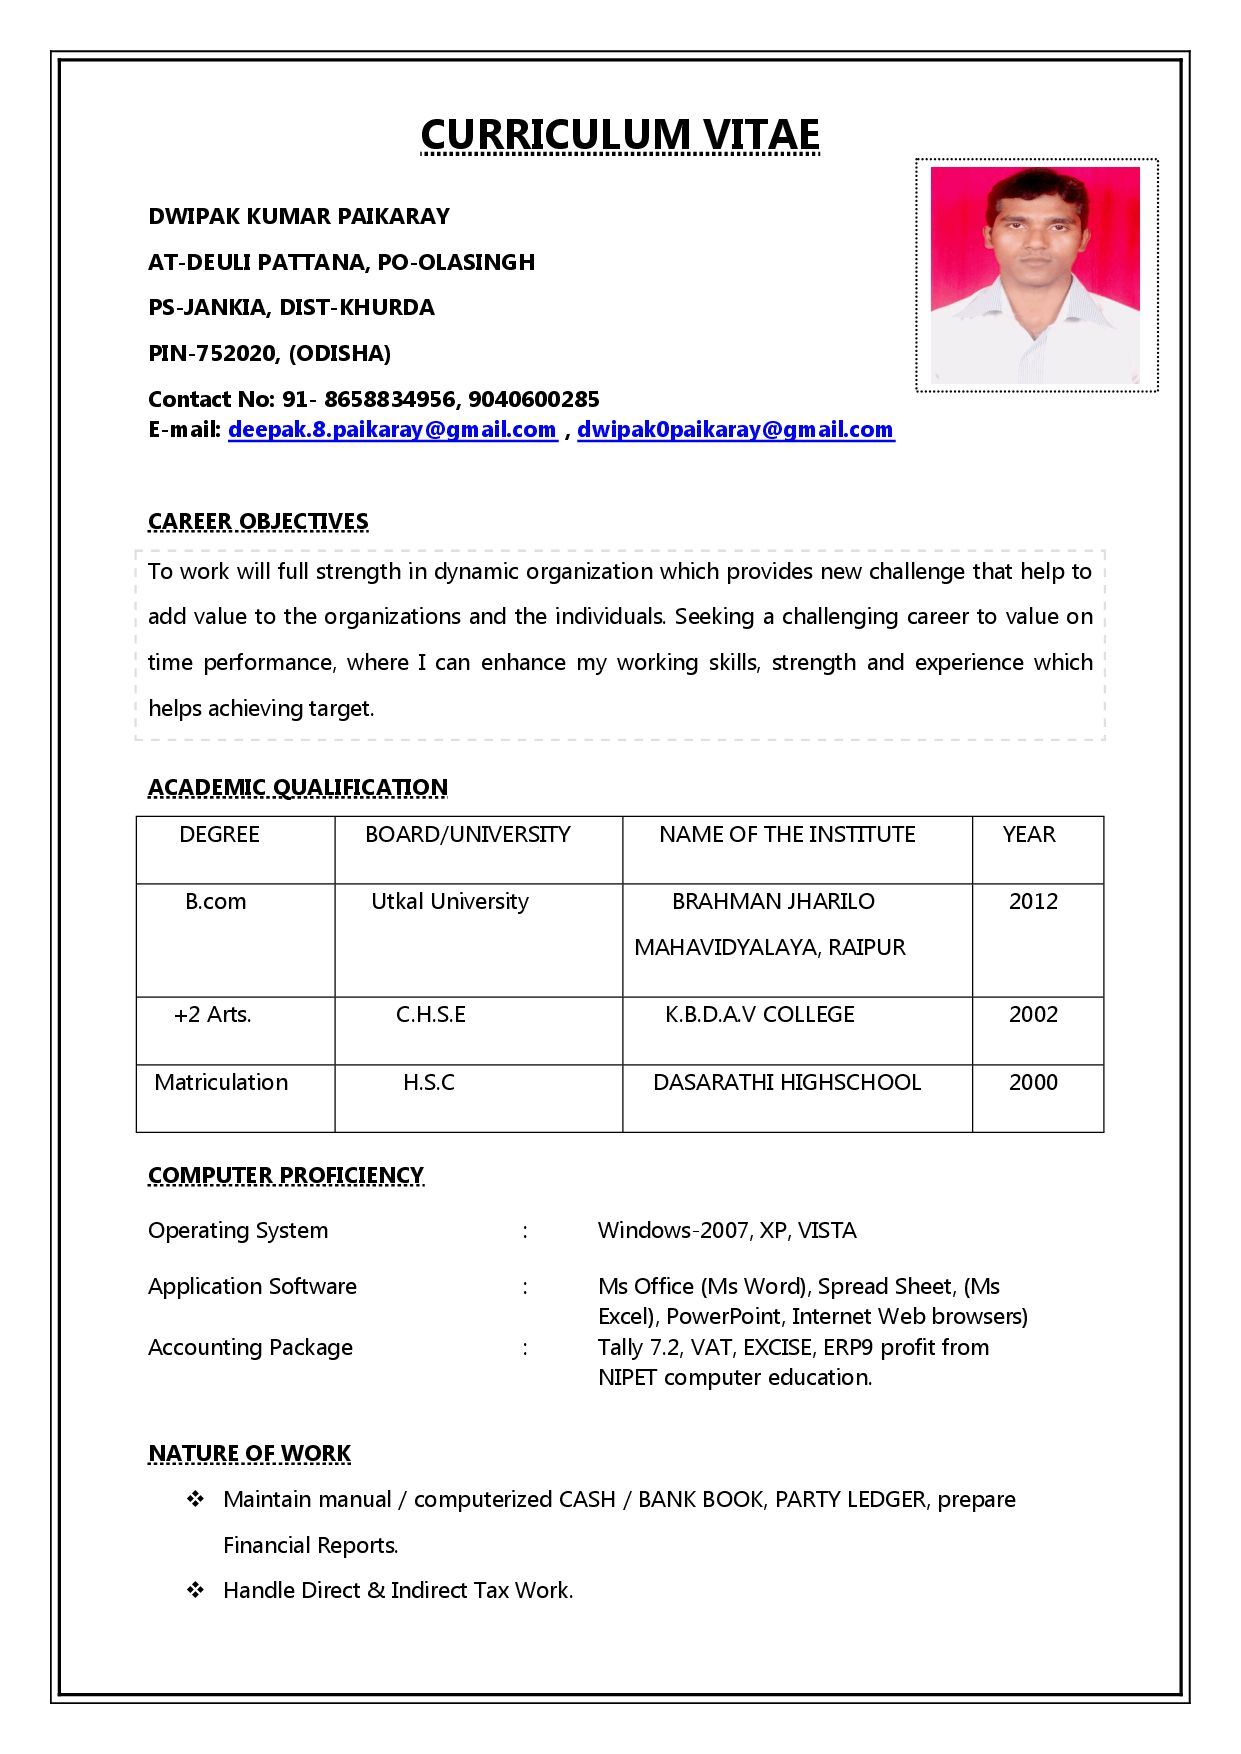 Resume Format Download For Fresher